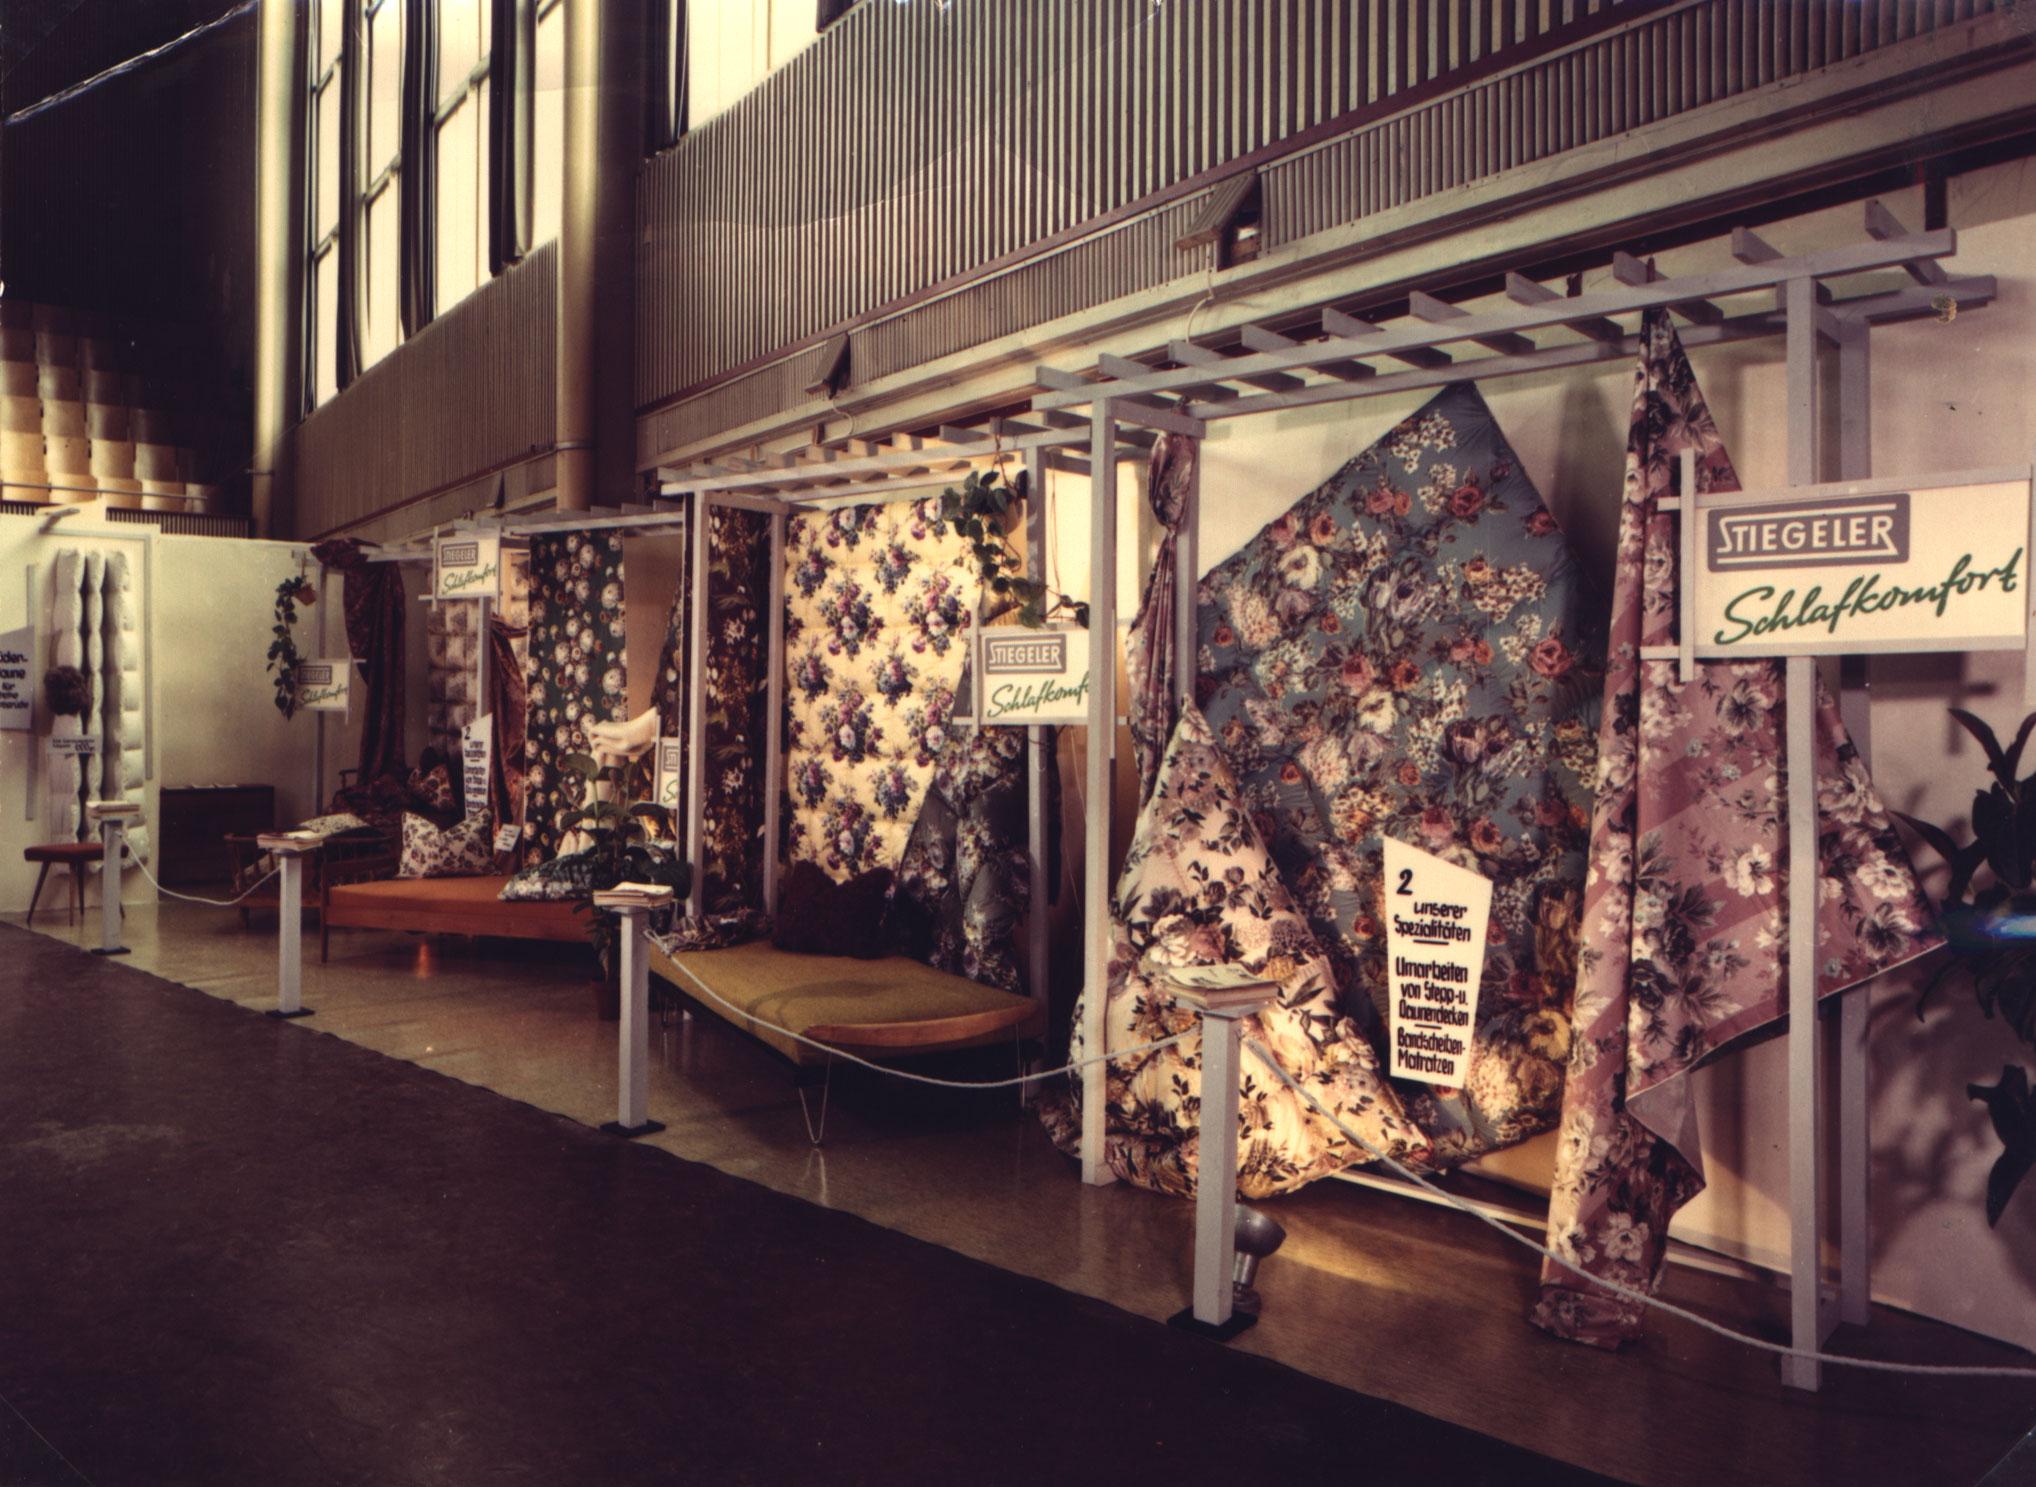 Stiegeler Textilien Sortiment